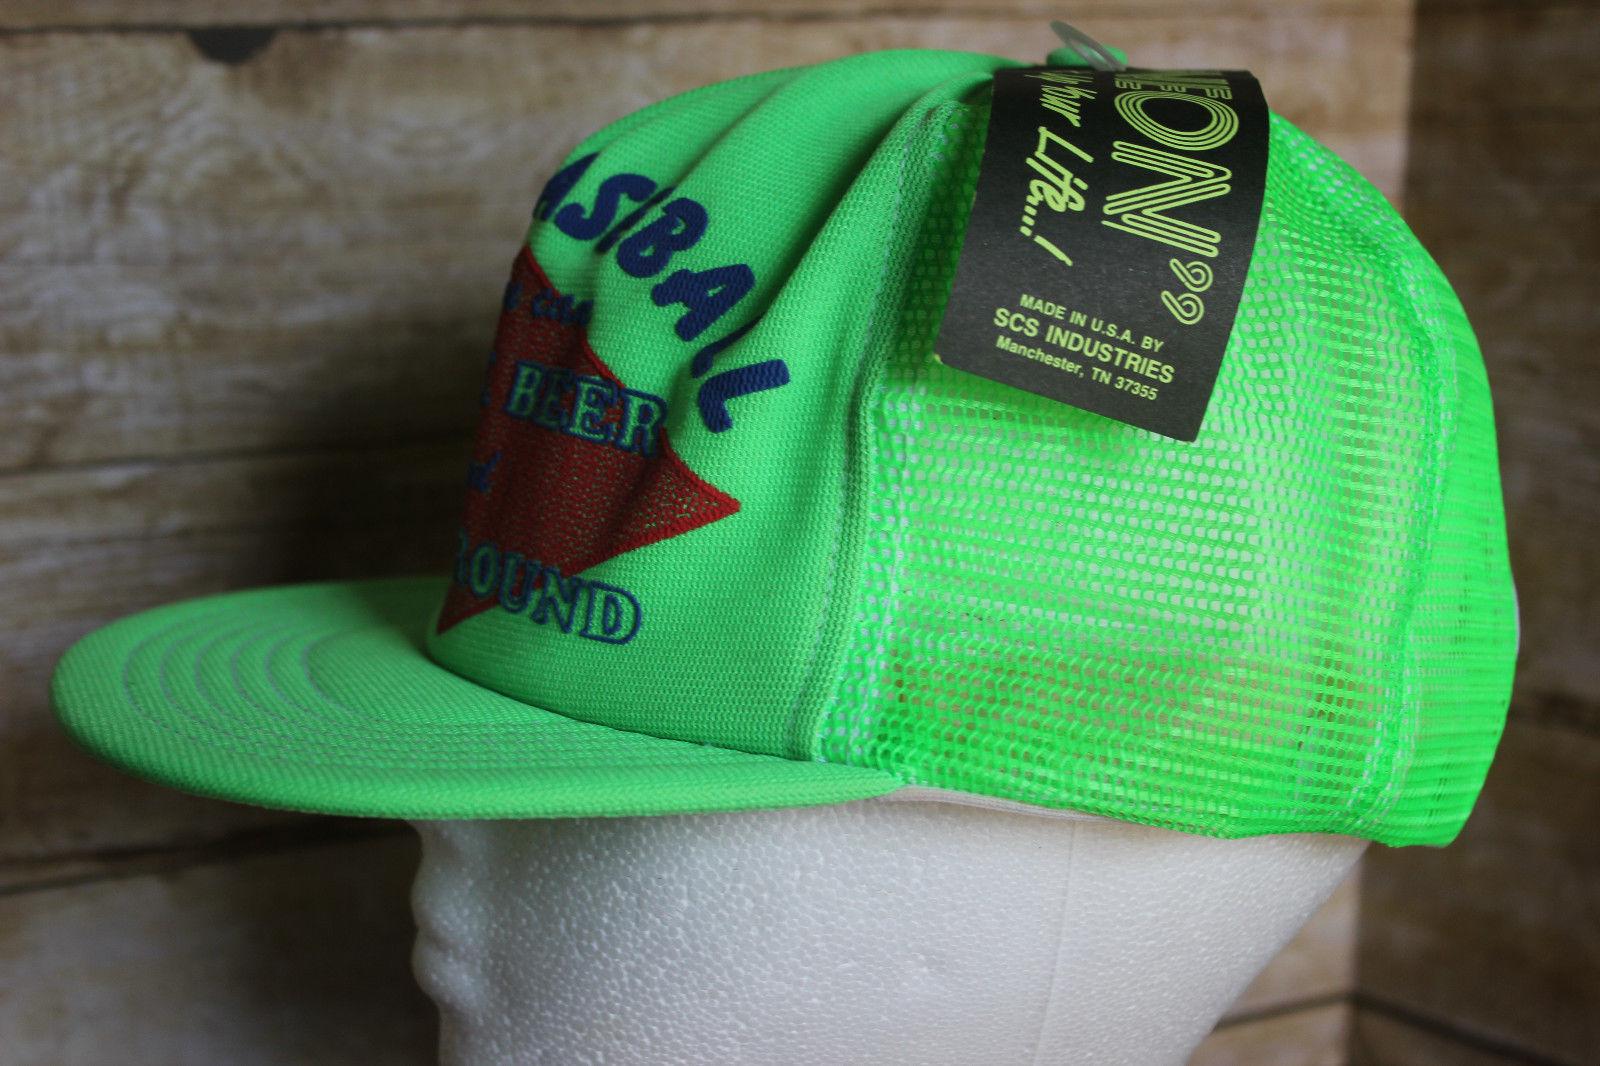 Vintage 80s Play Baseball Drink Beer & Run Around Trucker Hat Snap Back Cap  NOS